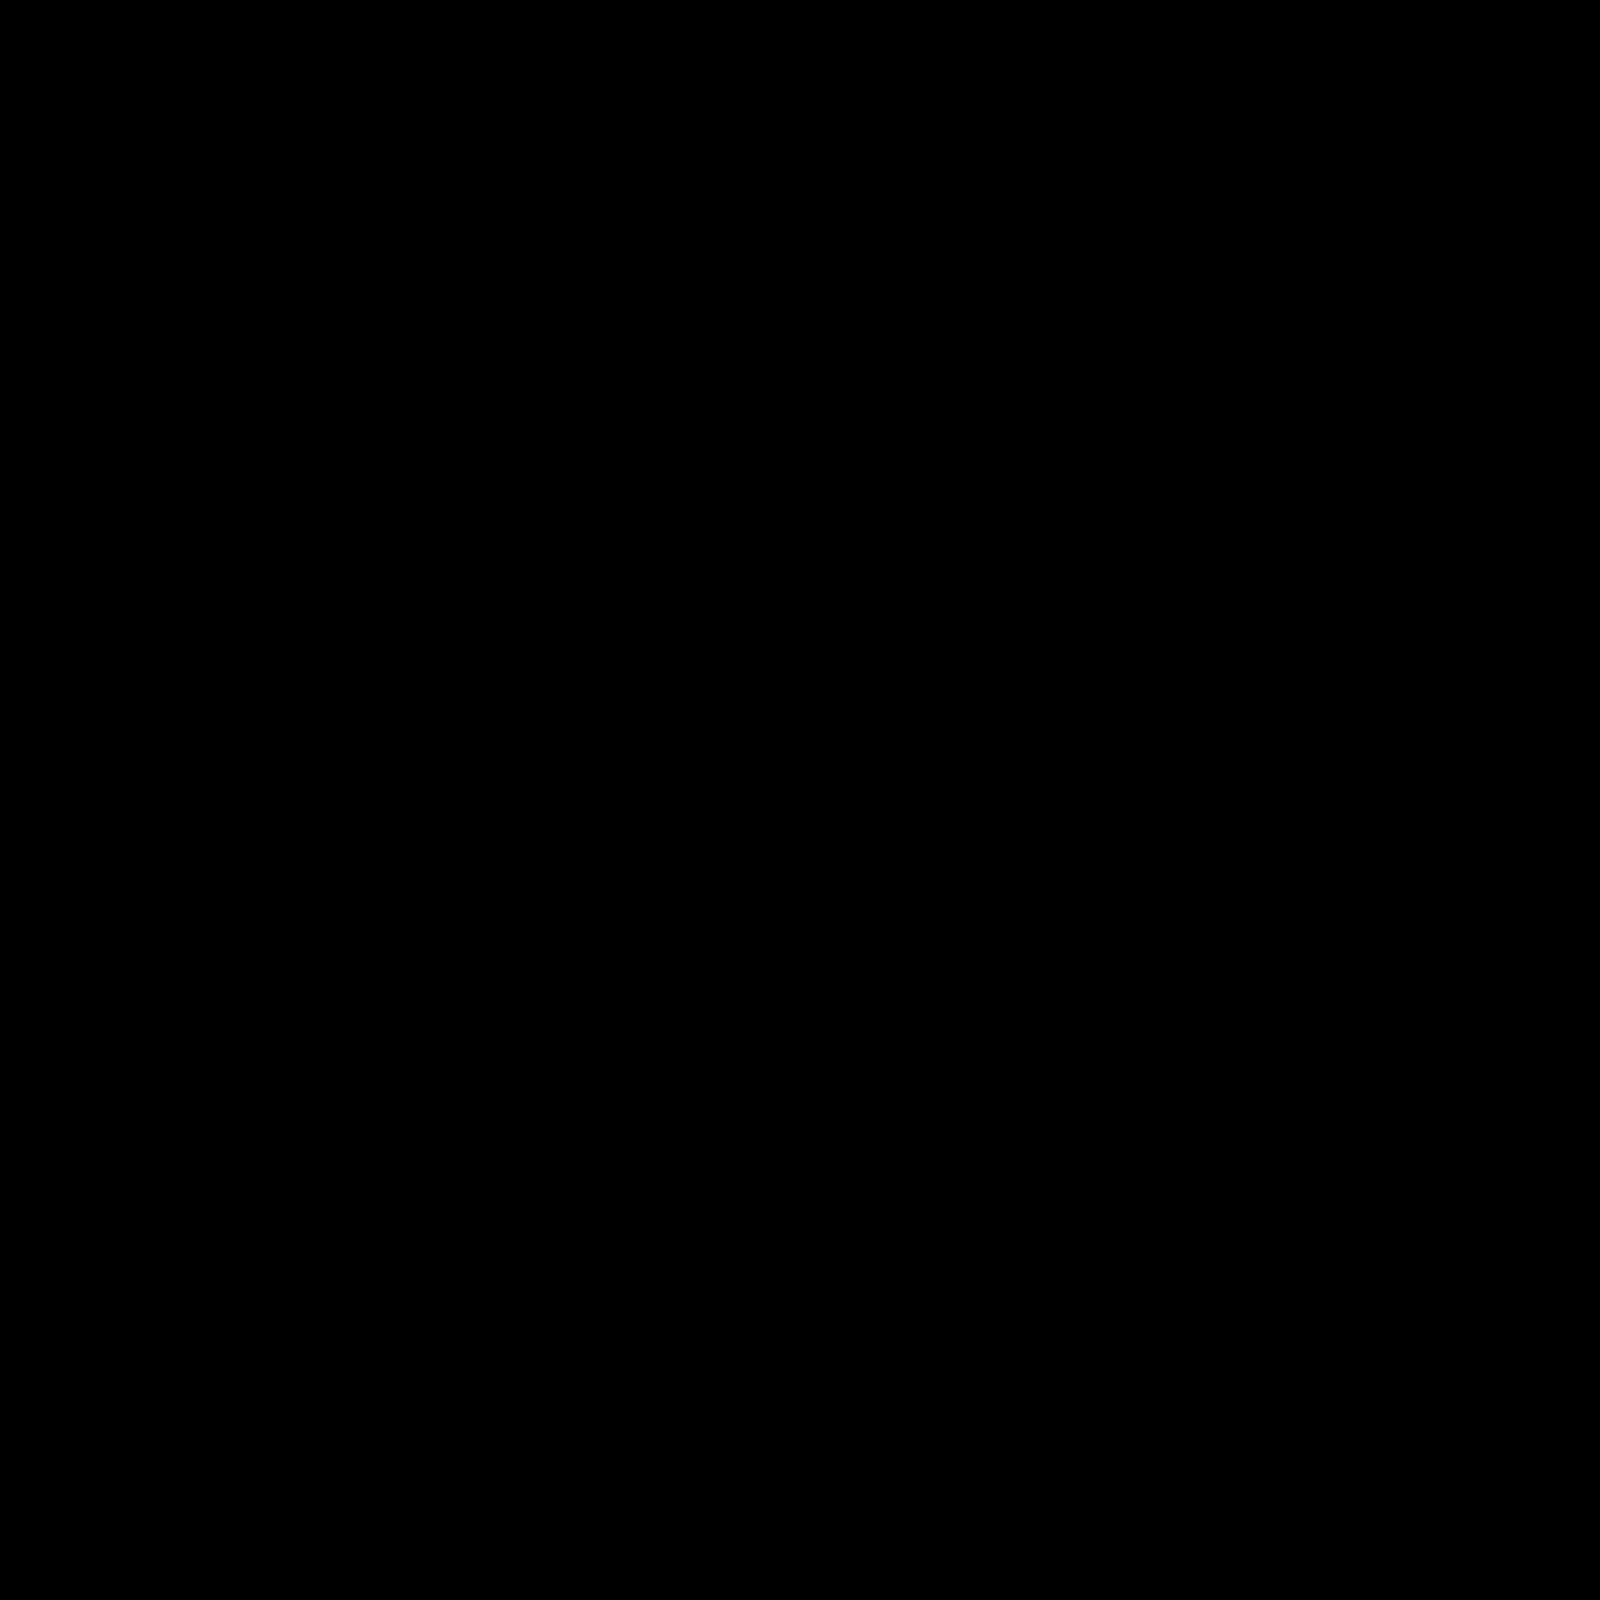 Hiragana Mu Filled icon